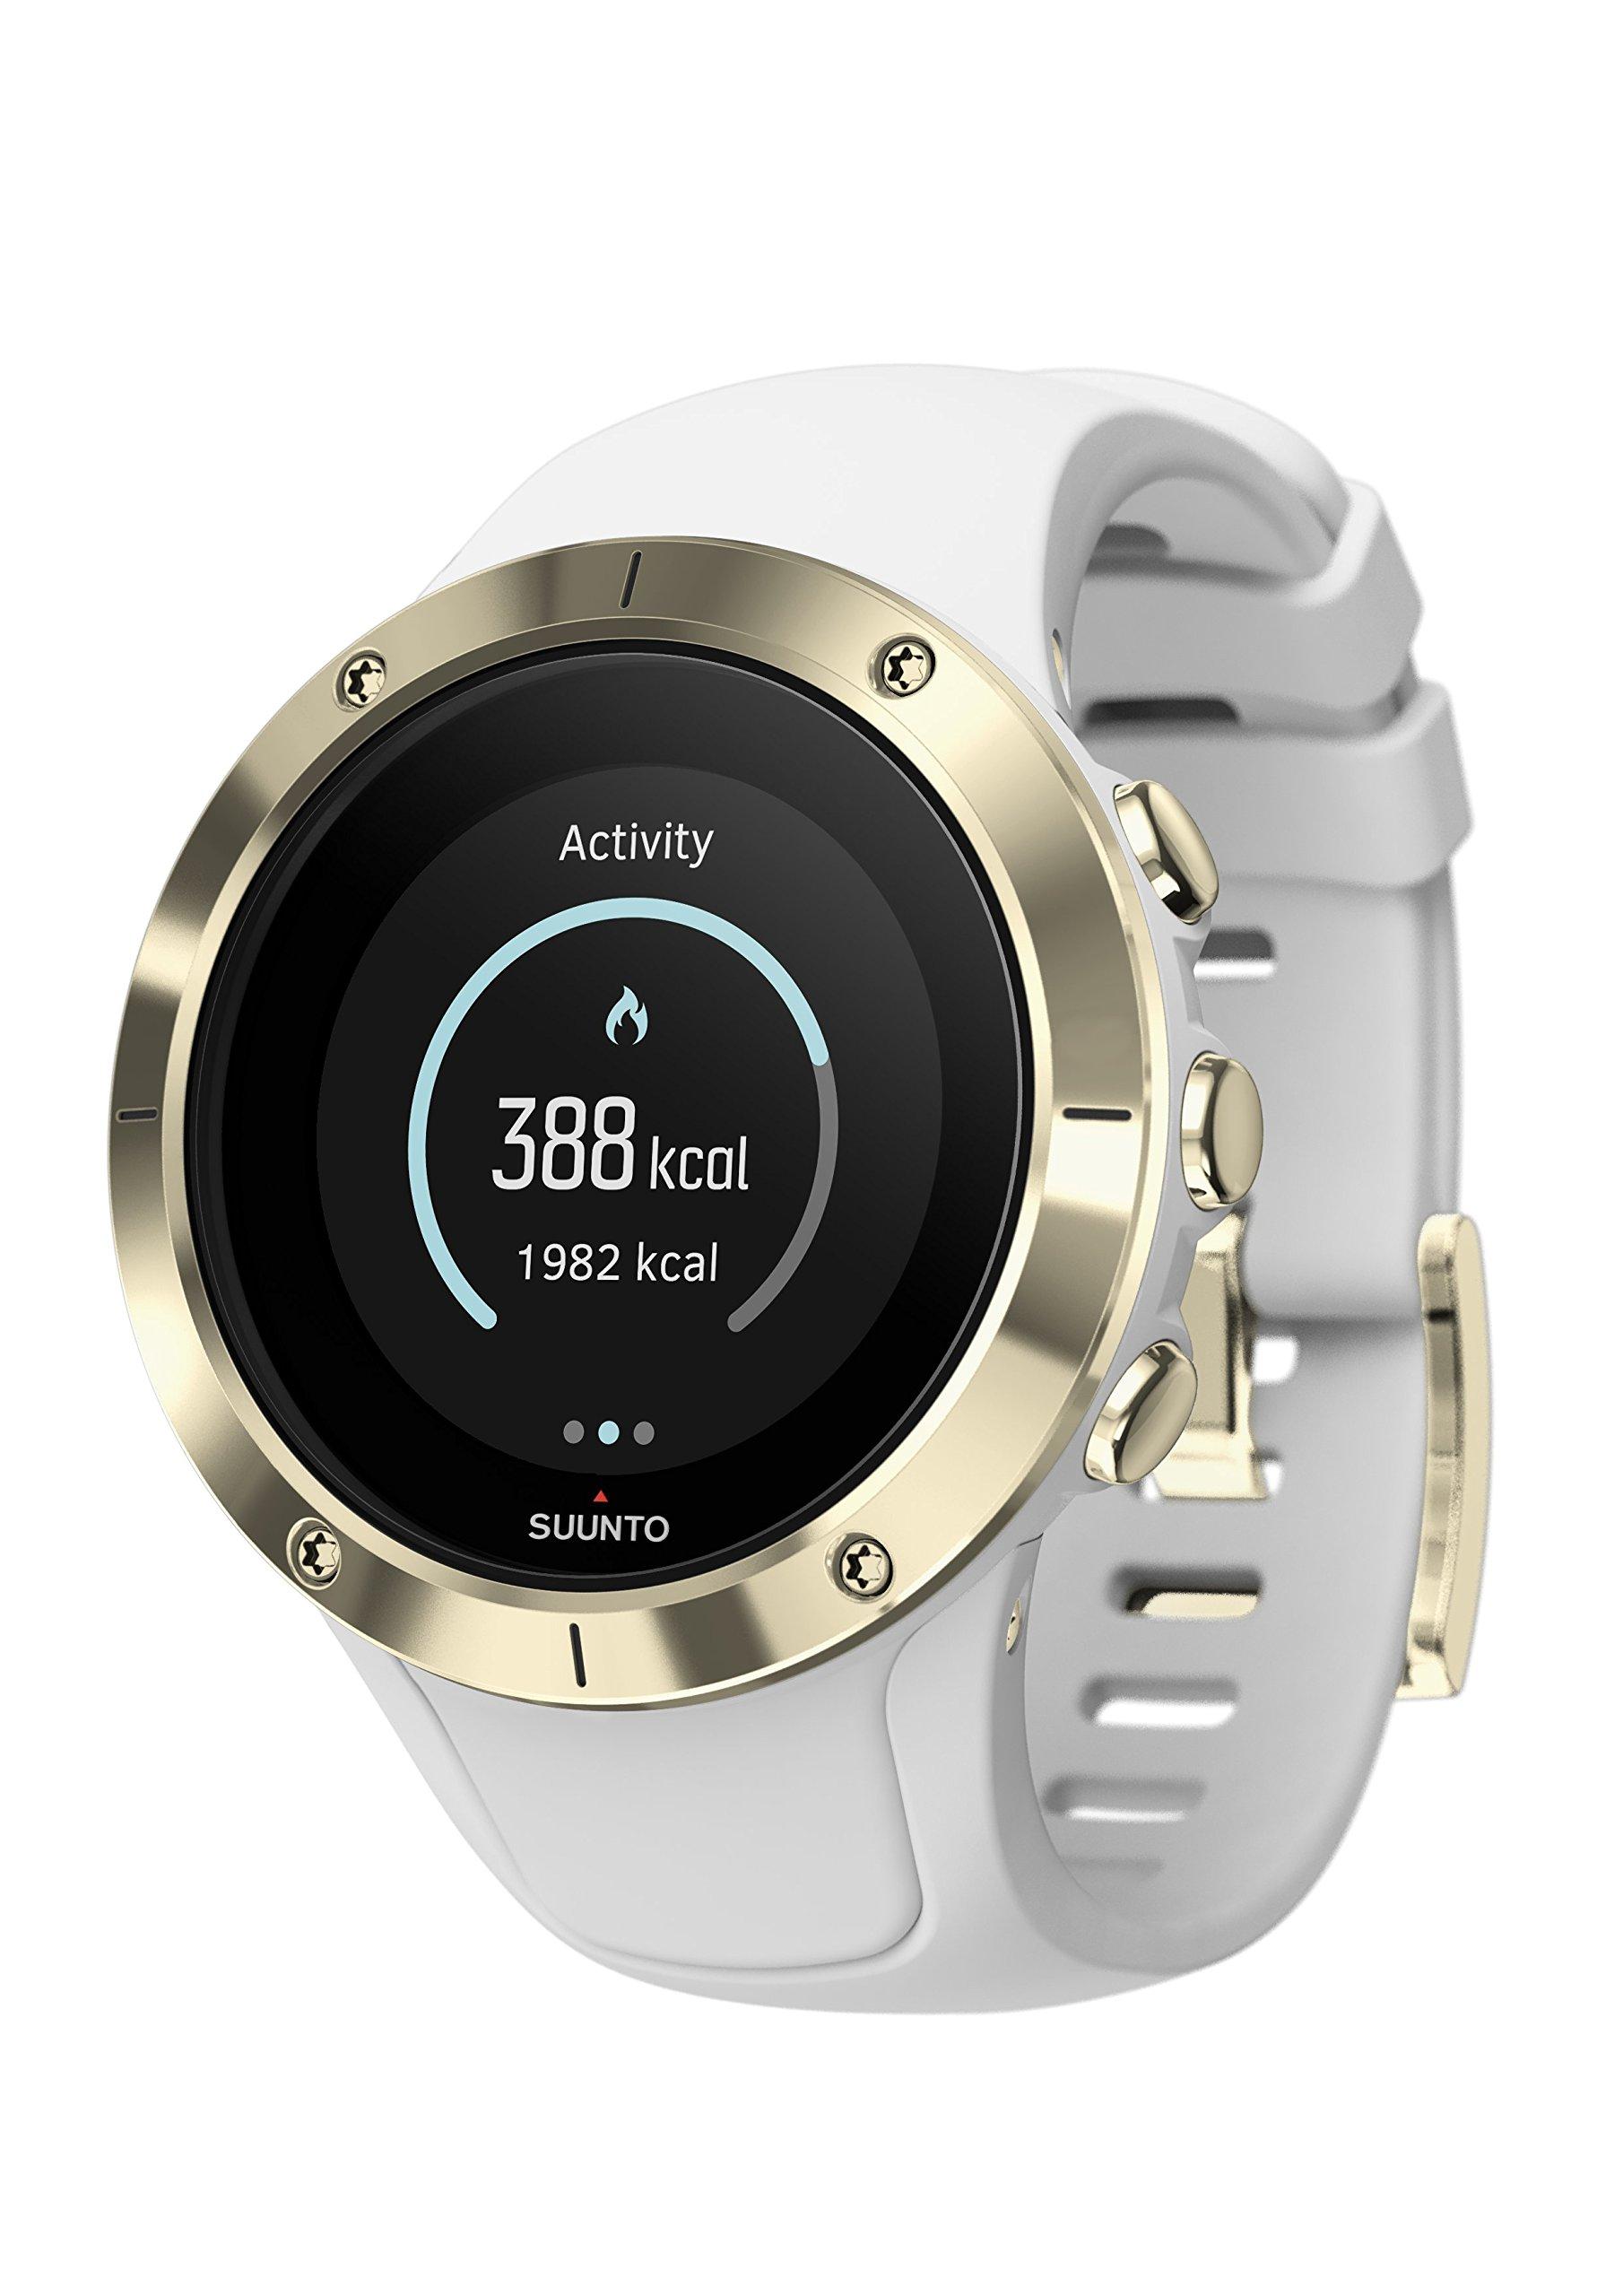 Suunto Spartan Trainer Wrist HR Multisport GPS Watch (Gold) by Suunto (Image #10)